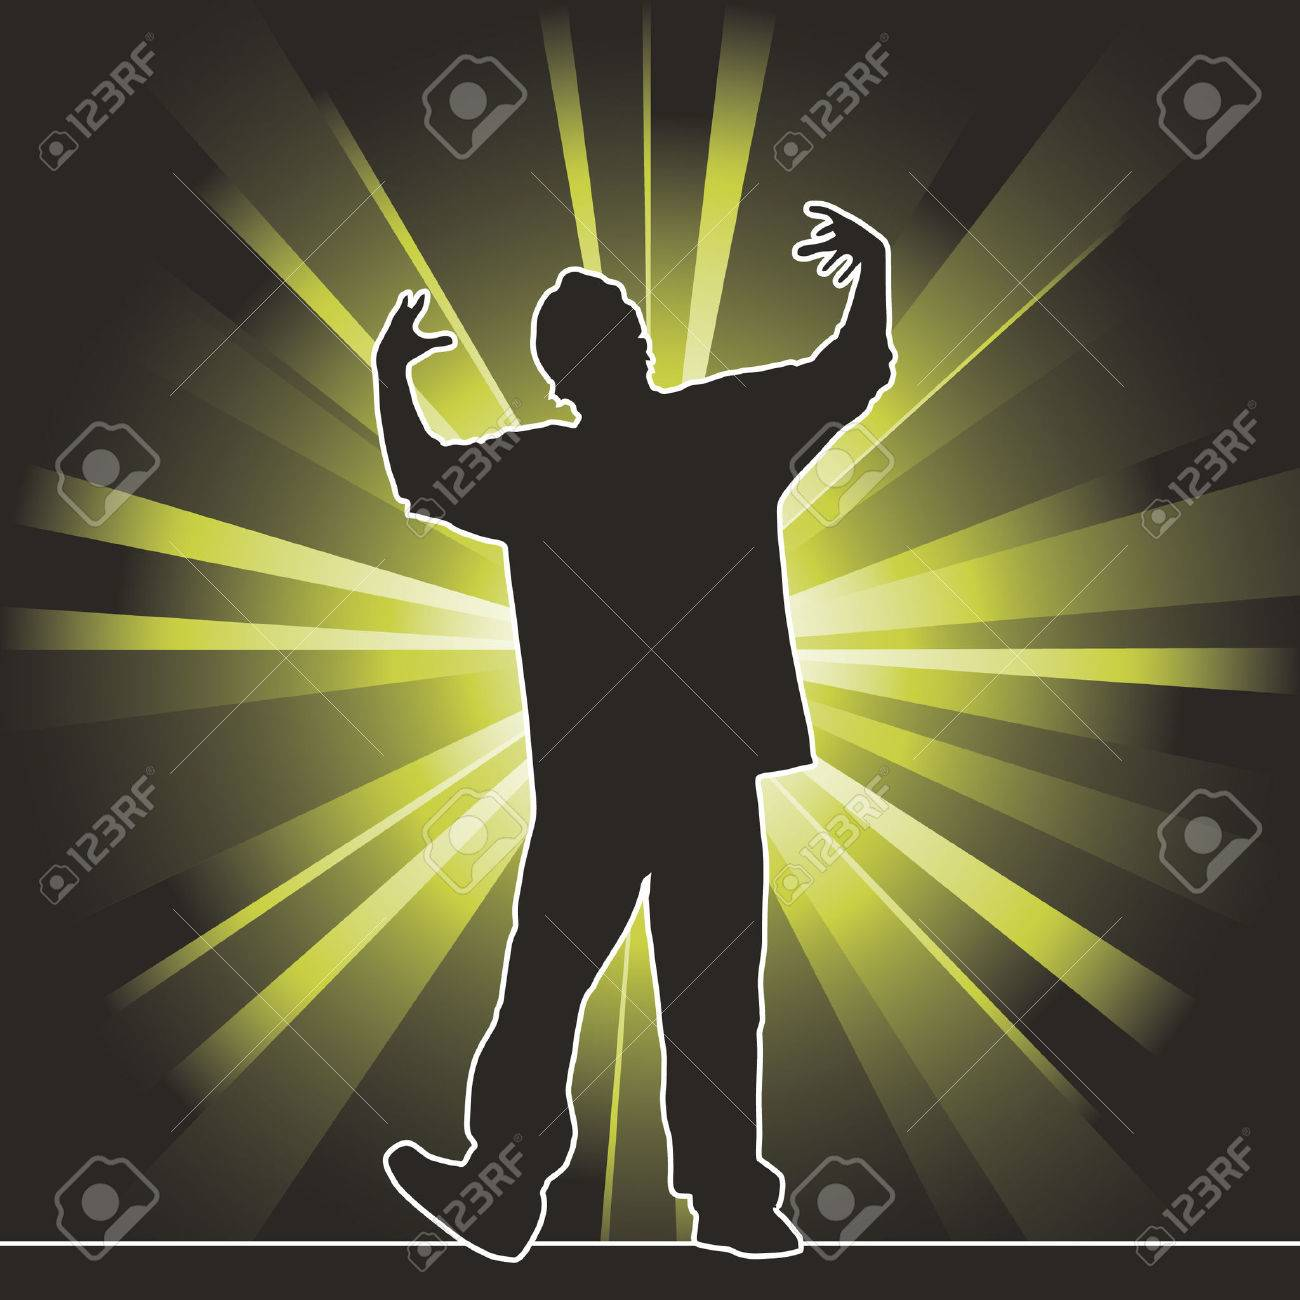 dancing silhouette, hip-hop, vector illustration Stock Vector - 5795902